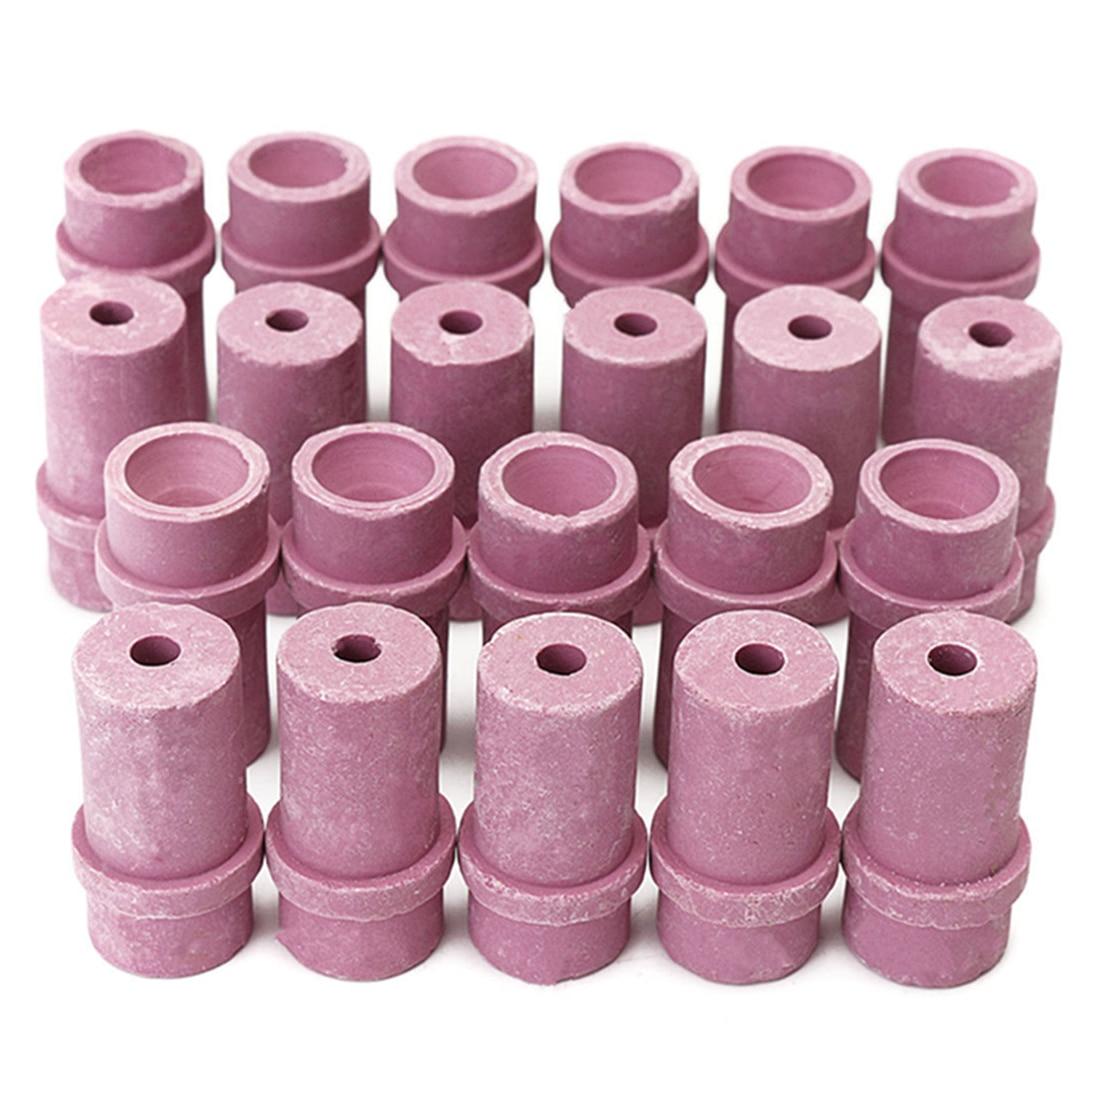 THGS 20Pcs Sandblaster Ceramic Nozzles Air Siphon Abrasive Sand Blasting Gun Nozzles